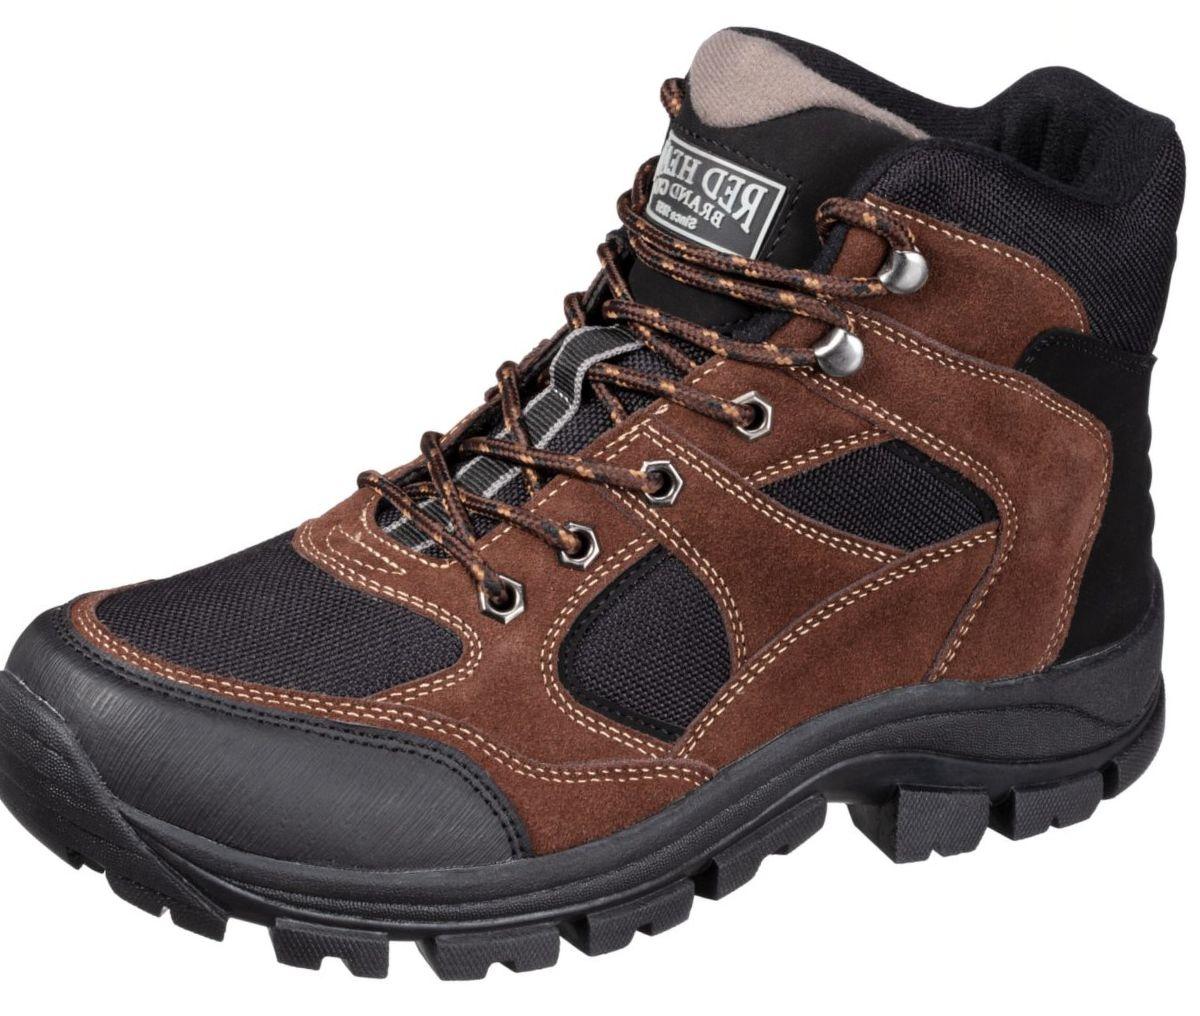 RedHead® Men's Everest III Hiking Boots